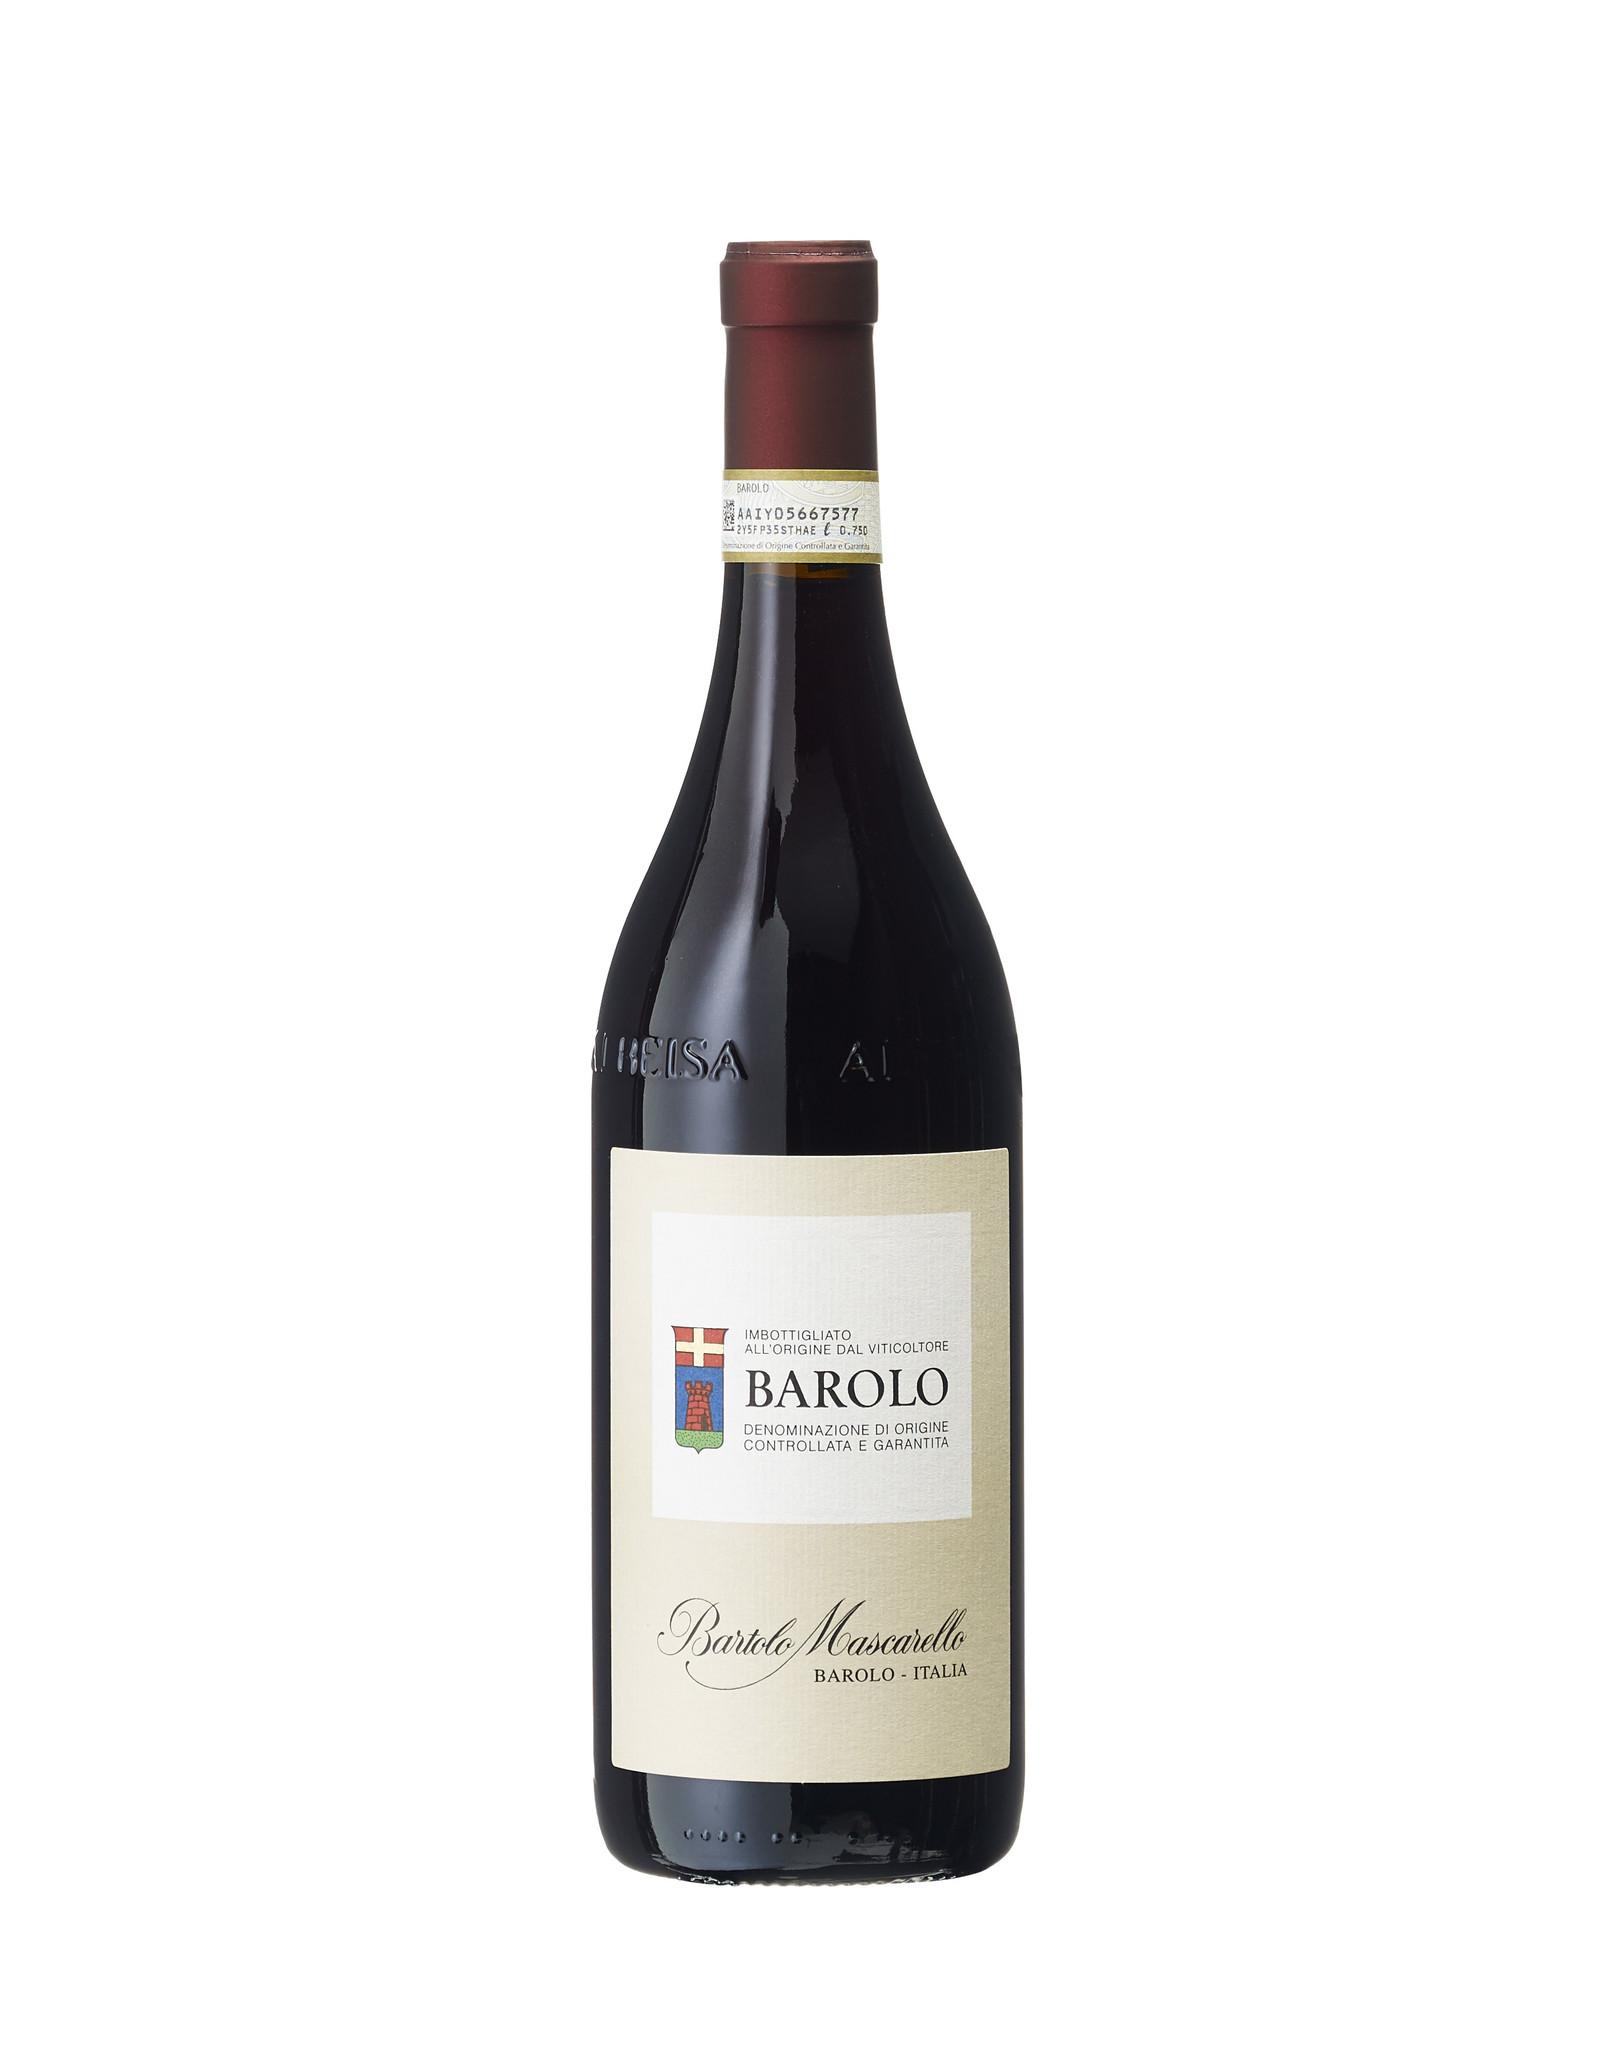 Bartolo Mascarello Barolo 2013 (NB 1 fles per klant)